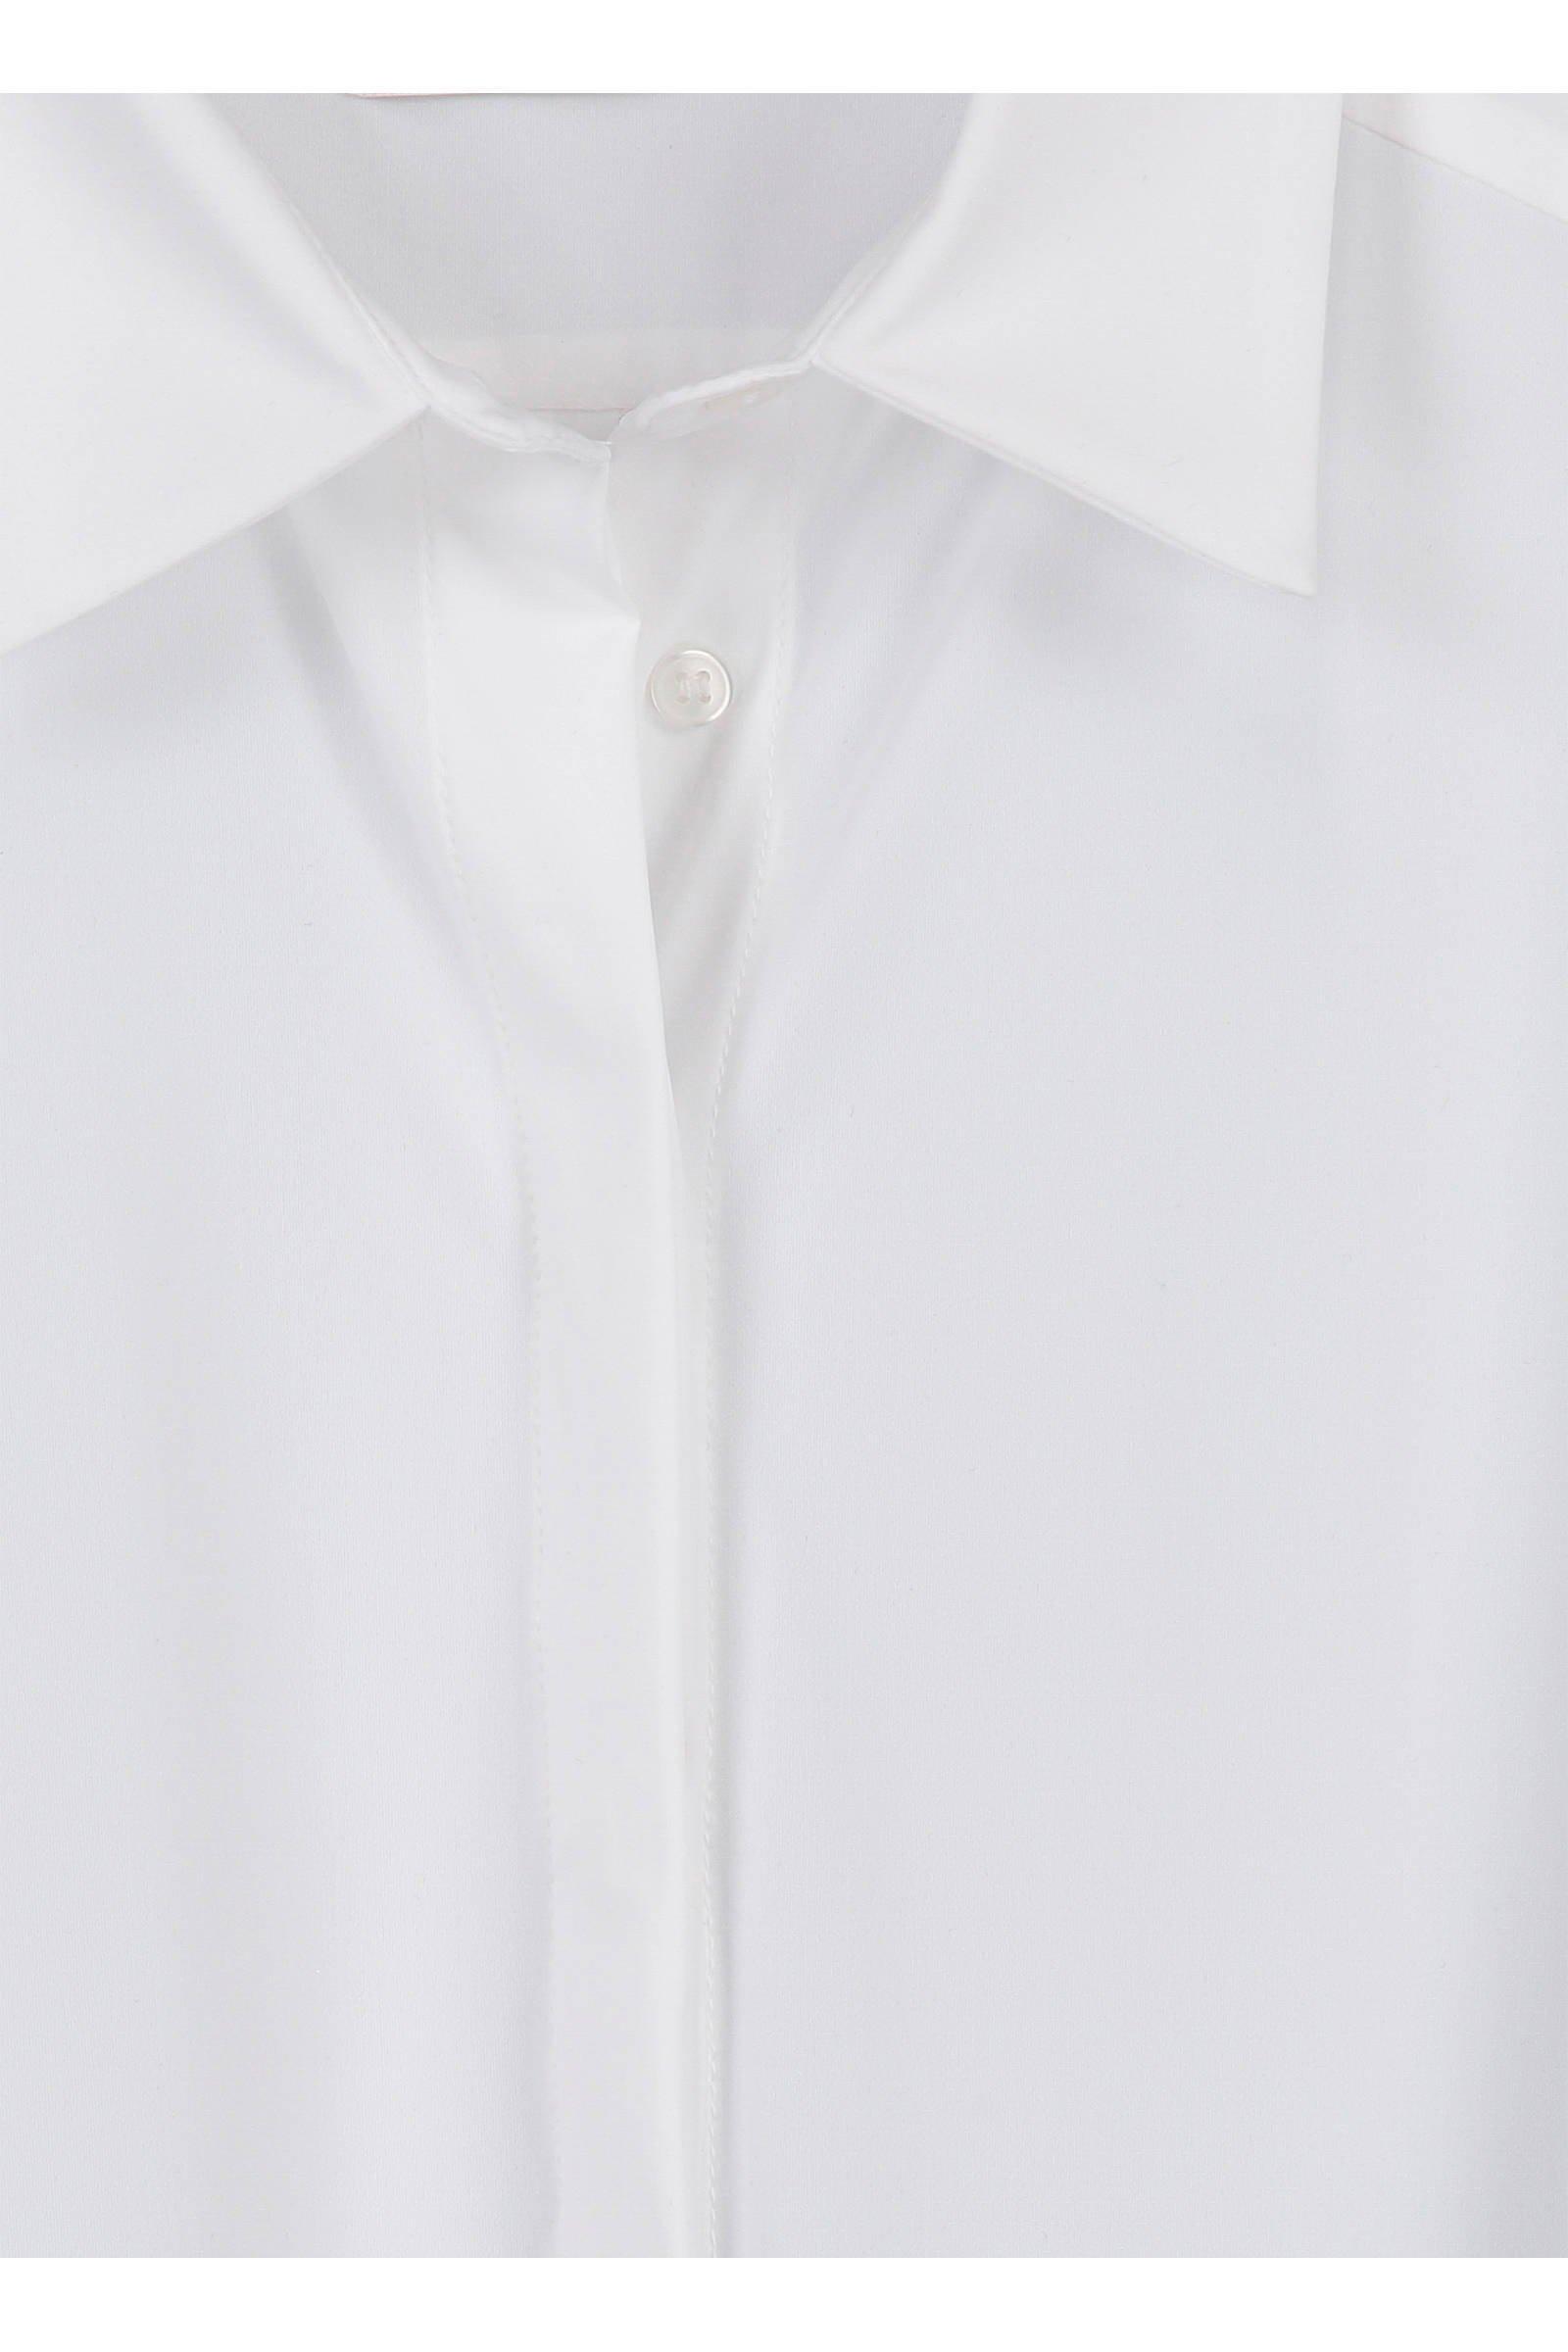 Claudia Claudia blouse wit Sträter Claudia Sträter blouse blouse wit wit Sträter ErwUFxqHr